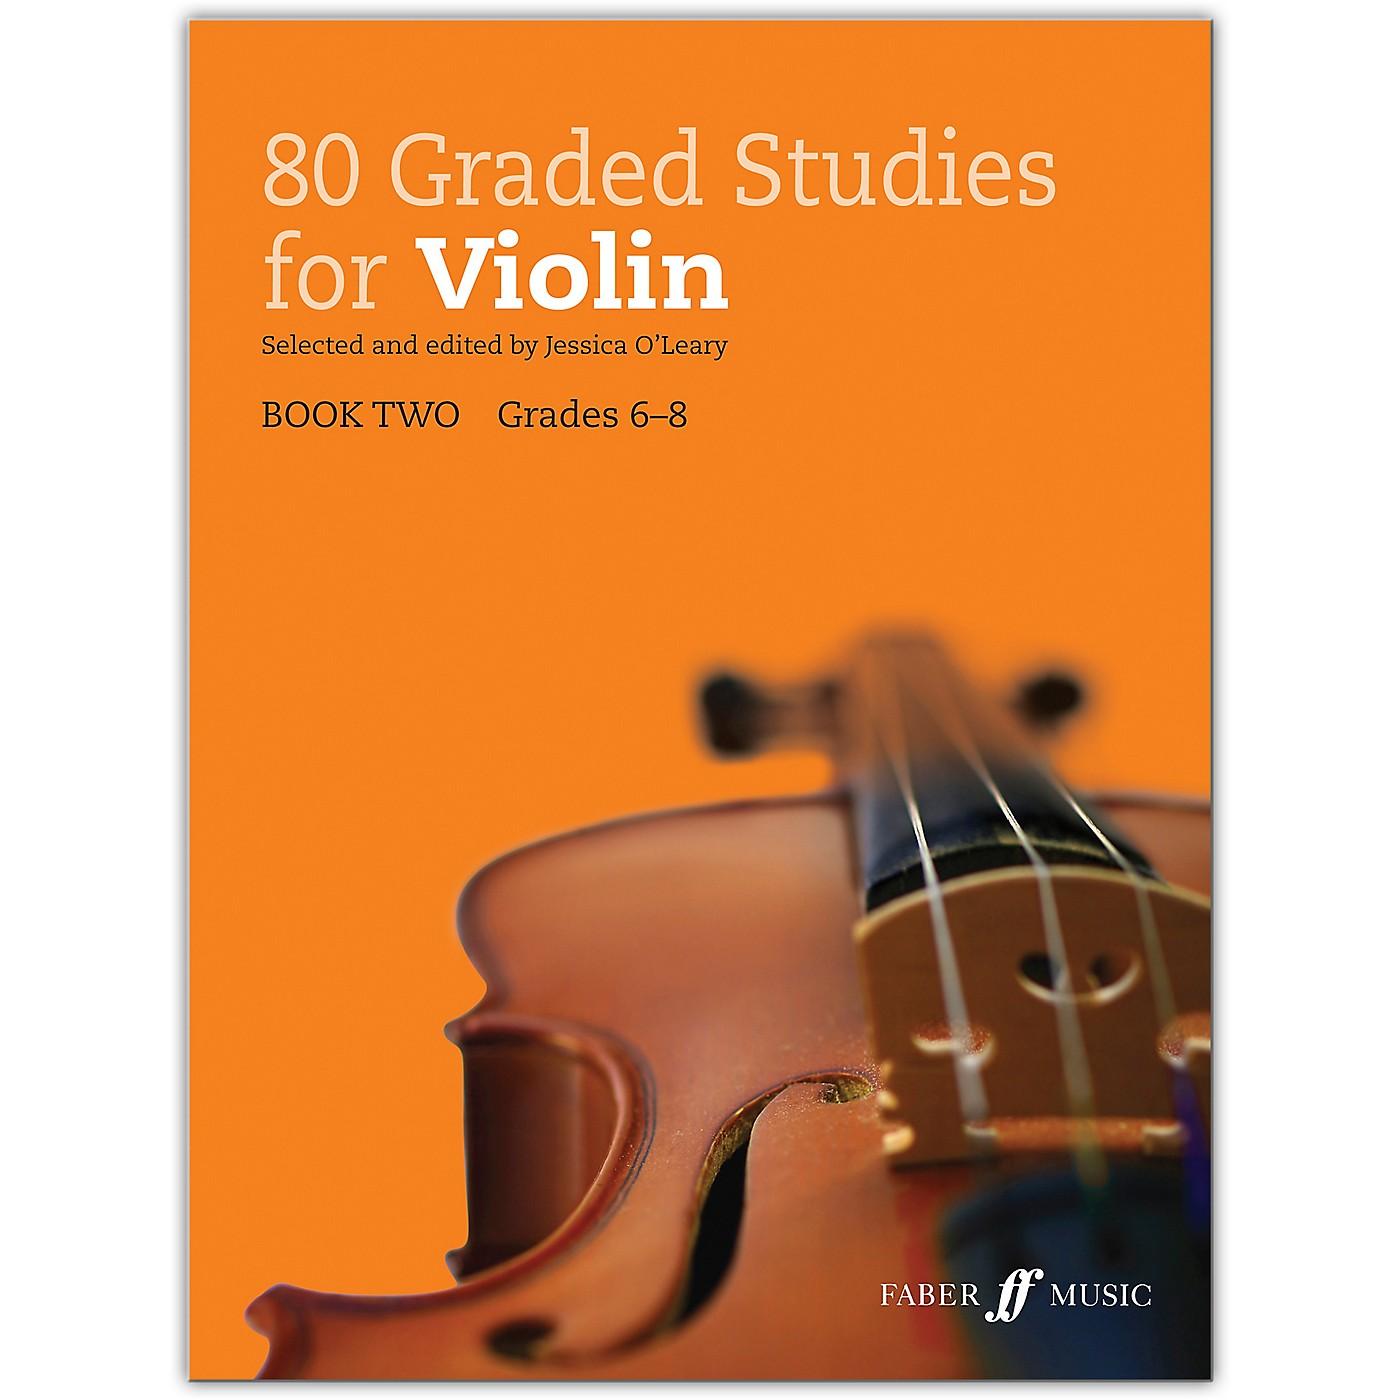 Faber Music LTD 80 Graded Studies for Violin, Book Two Grades 6-8 thumbnail